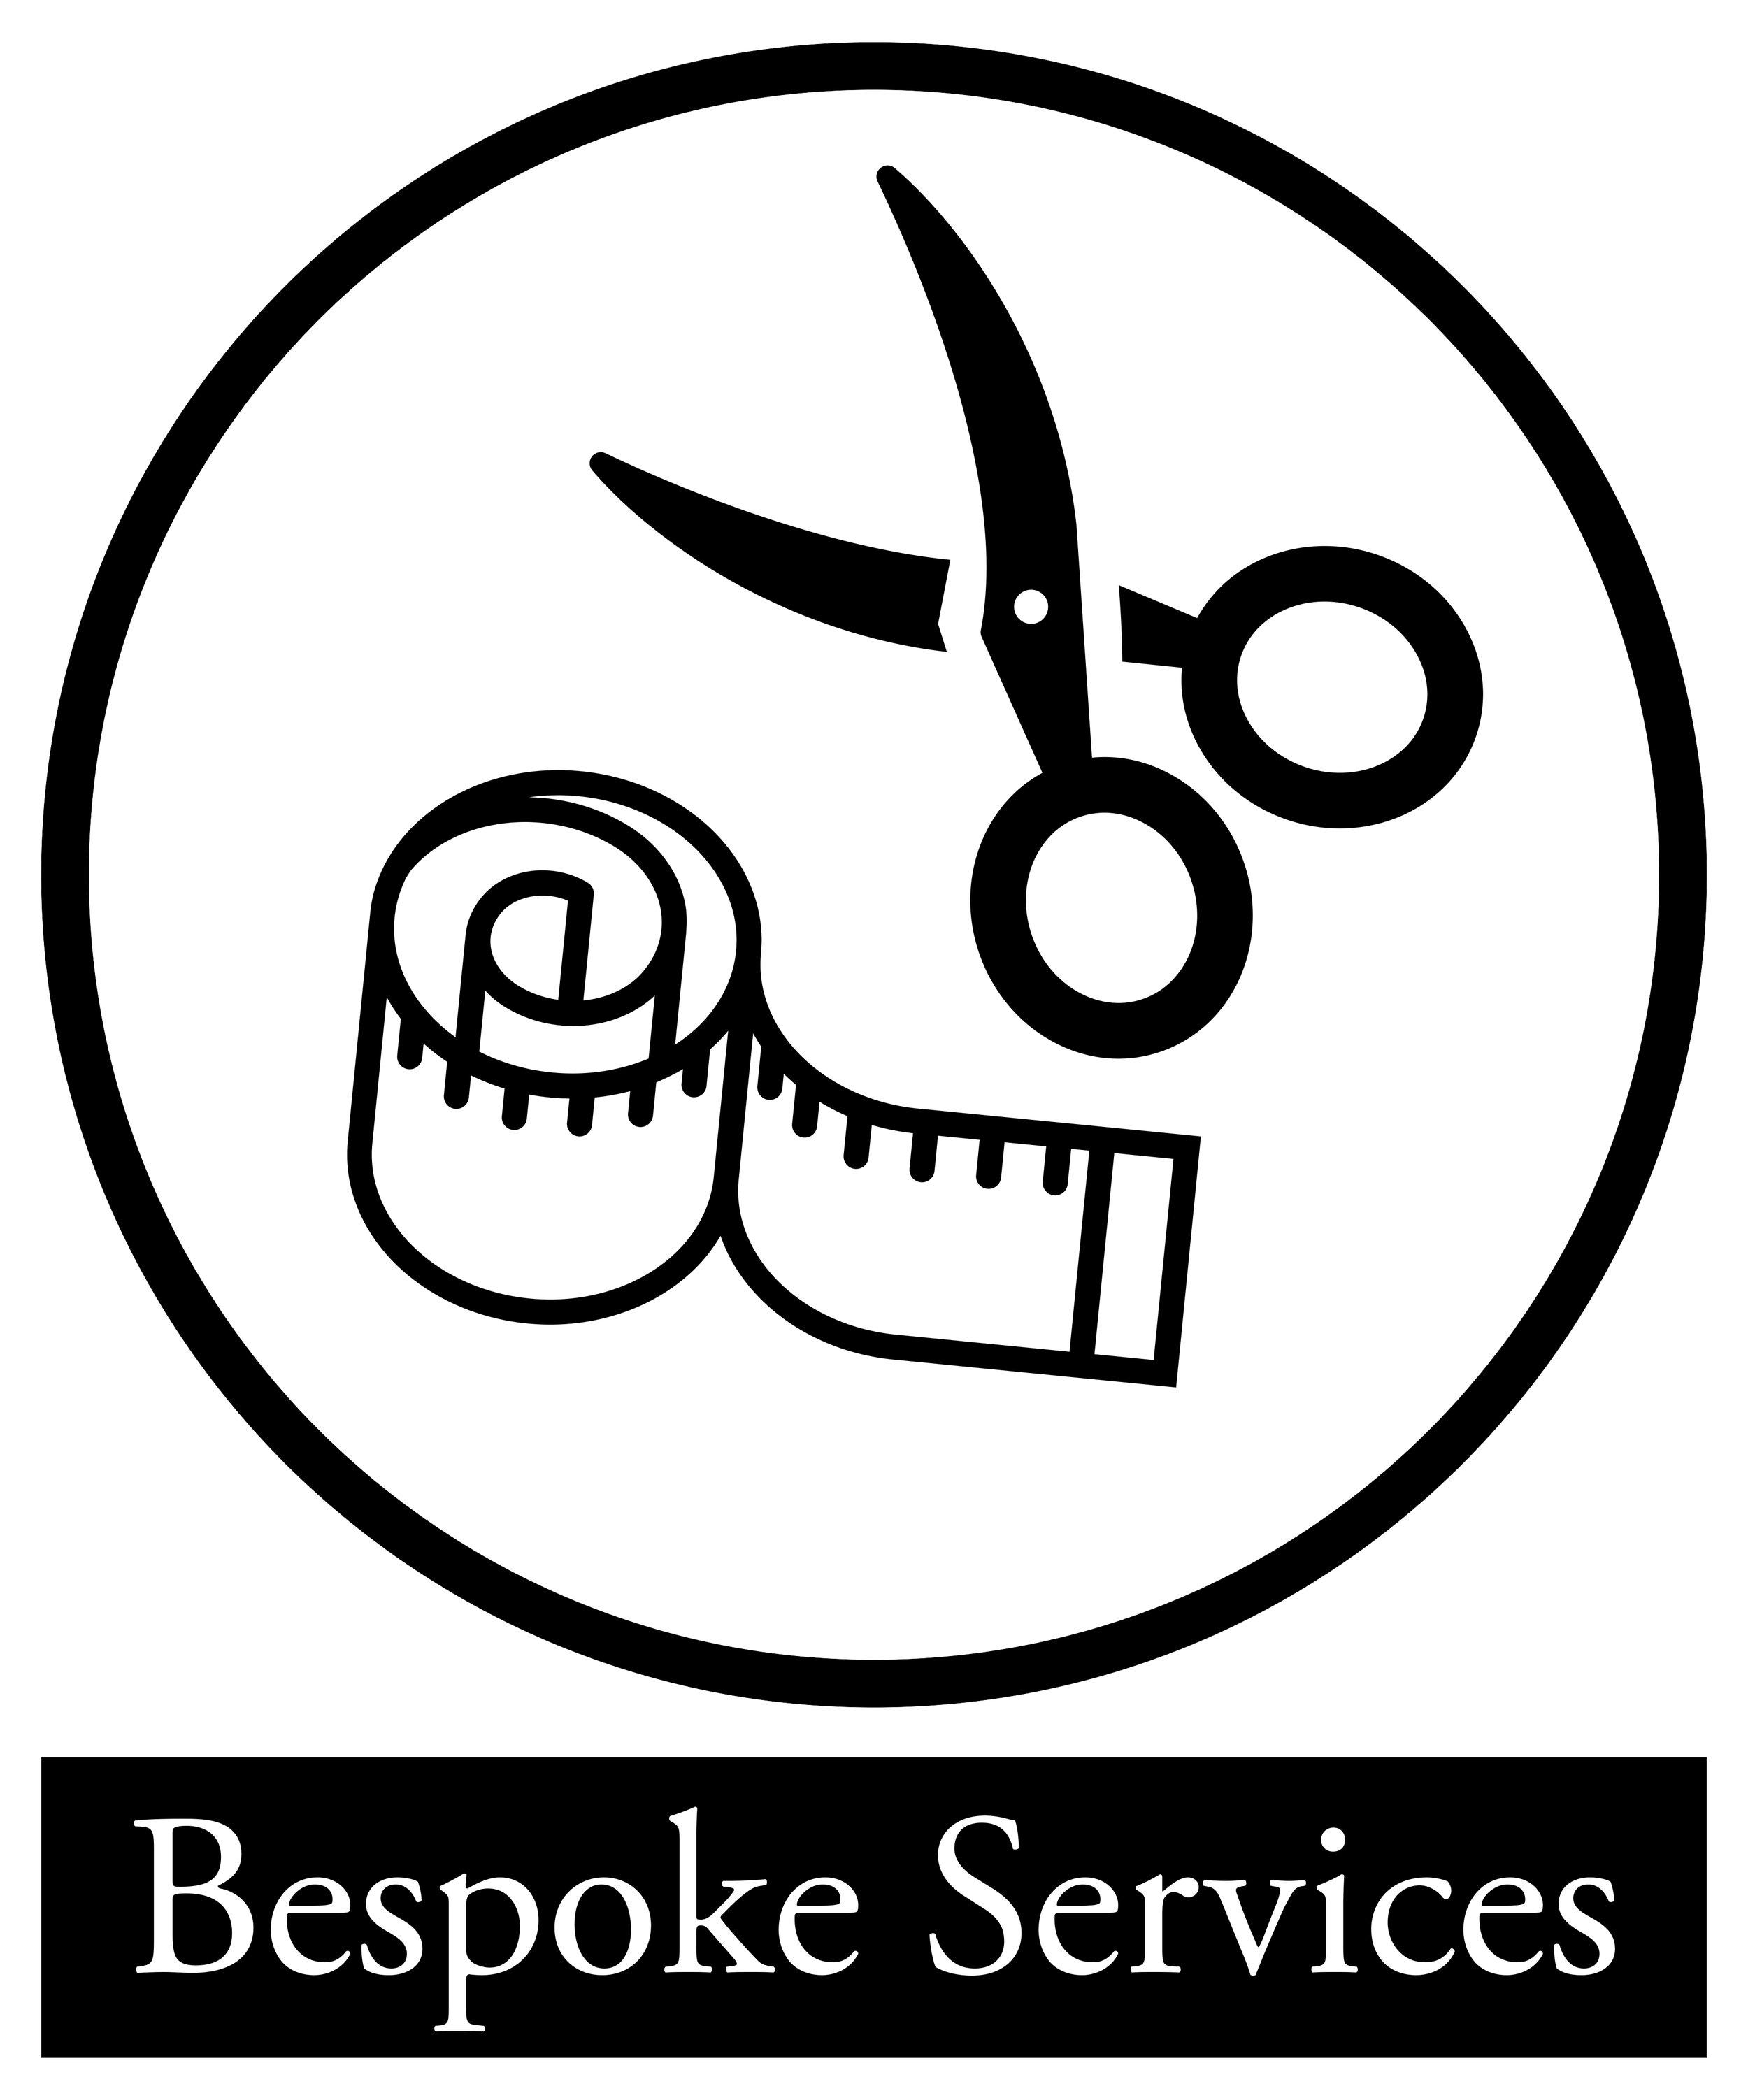 Bespoke Services